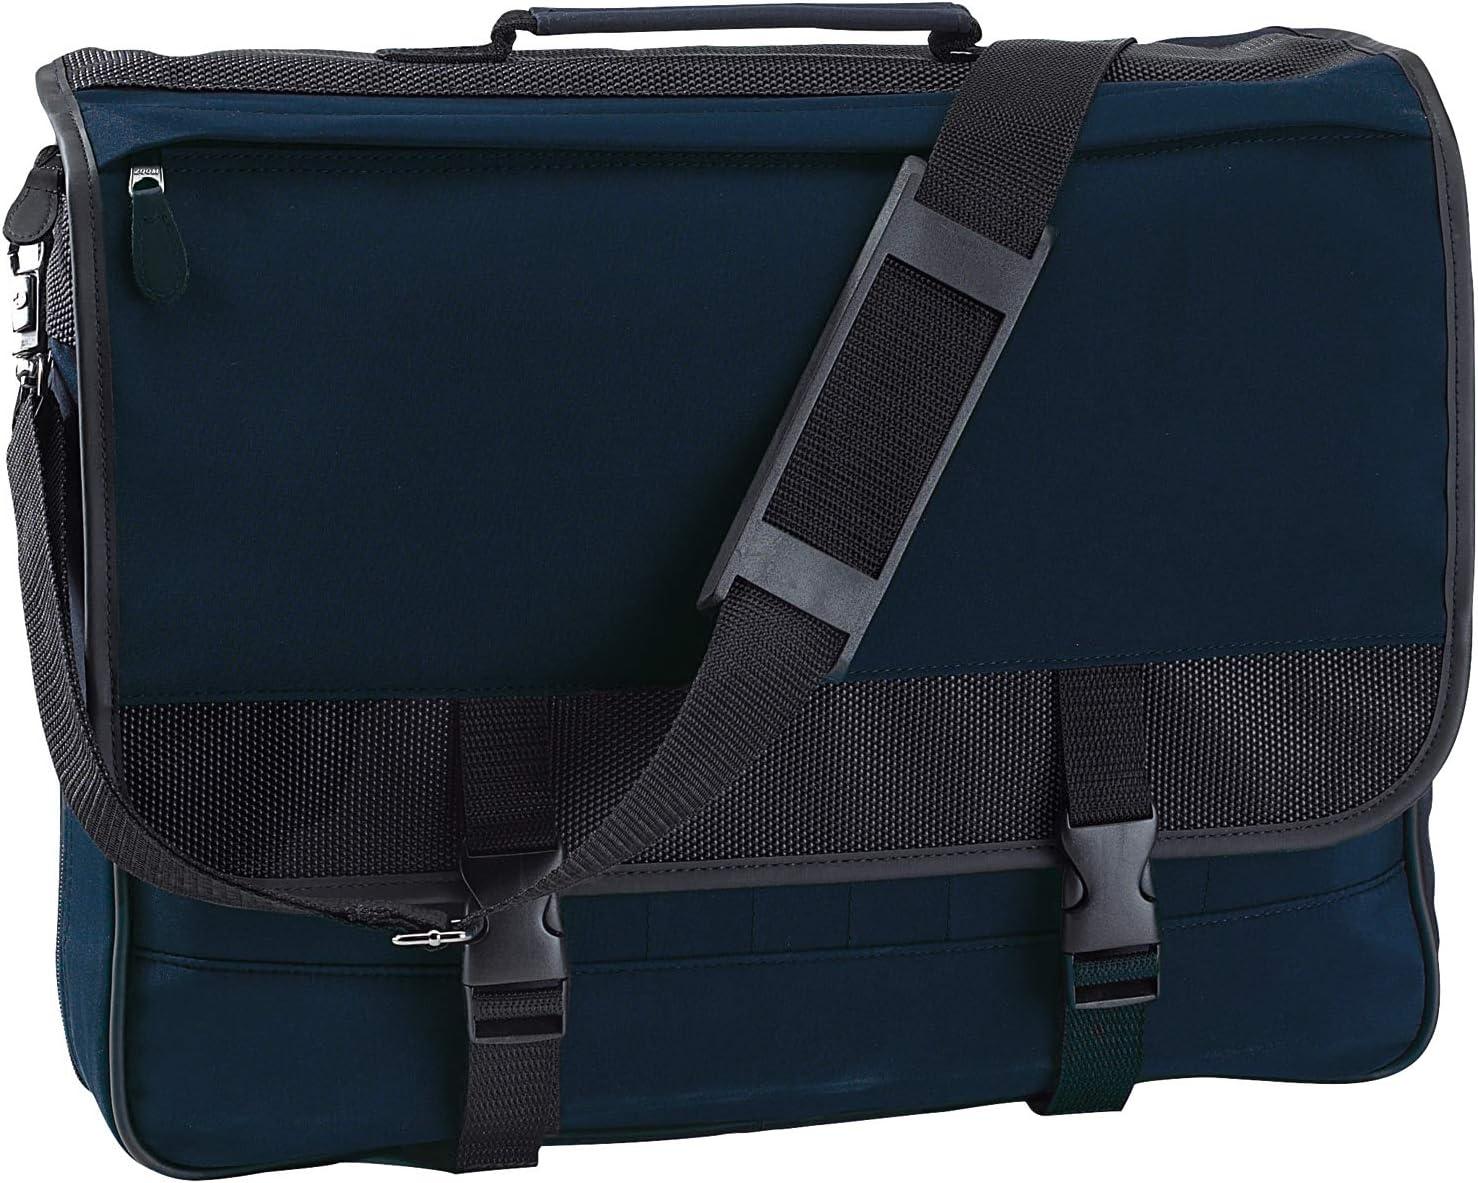 Messenger Bag 41 x 34 x 10cm Aktentasche ca 12 Liter Schultertasche Businessbag